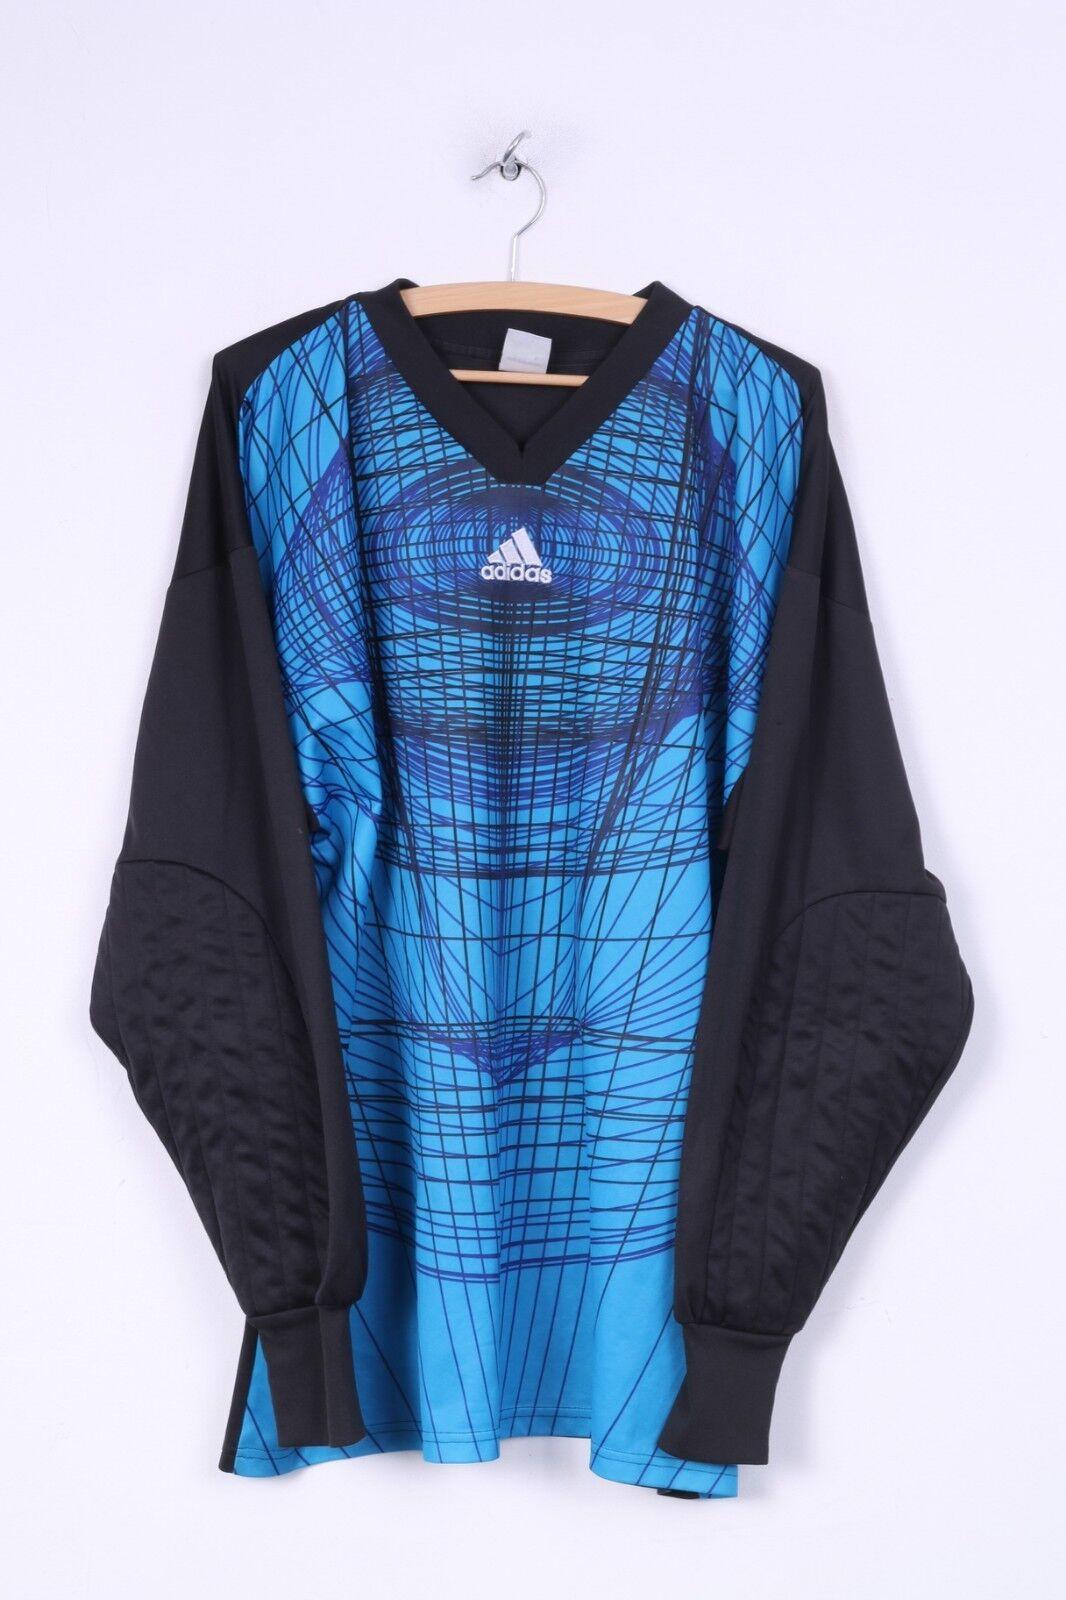 Camiseta adidas Mens XL, camiseta de portero, ropa deportiva deportiva, camiseta deportiva de fútbol de manga larga